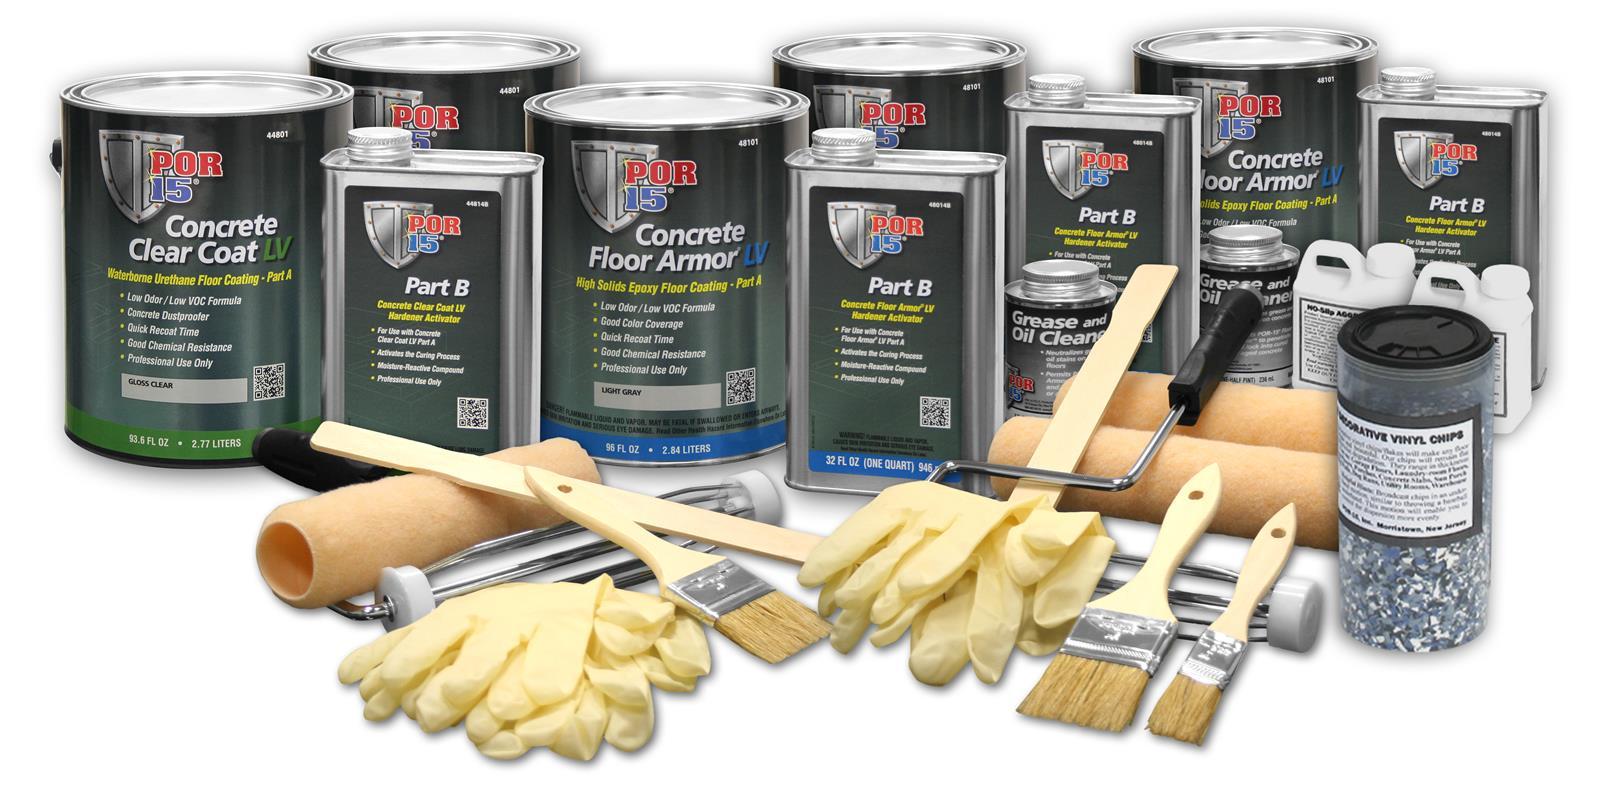 POR-15 Floor Armor® Deluxe Water-Based Concrete Coating Kits 48169